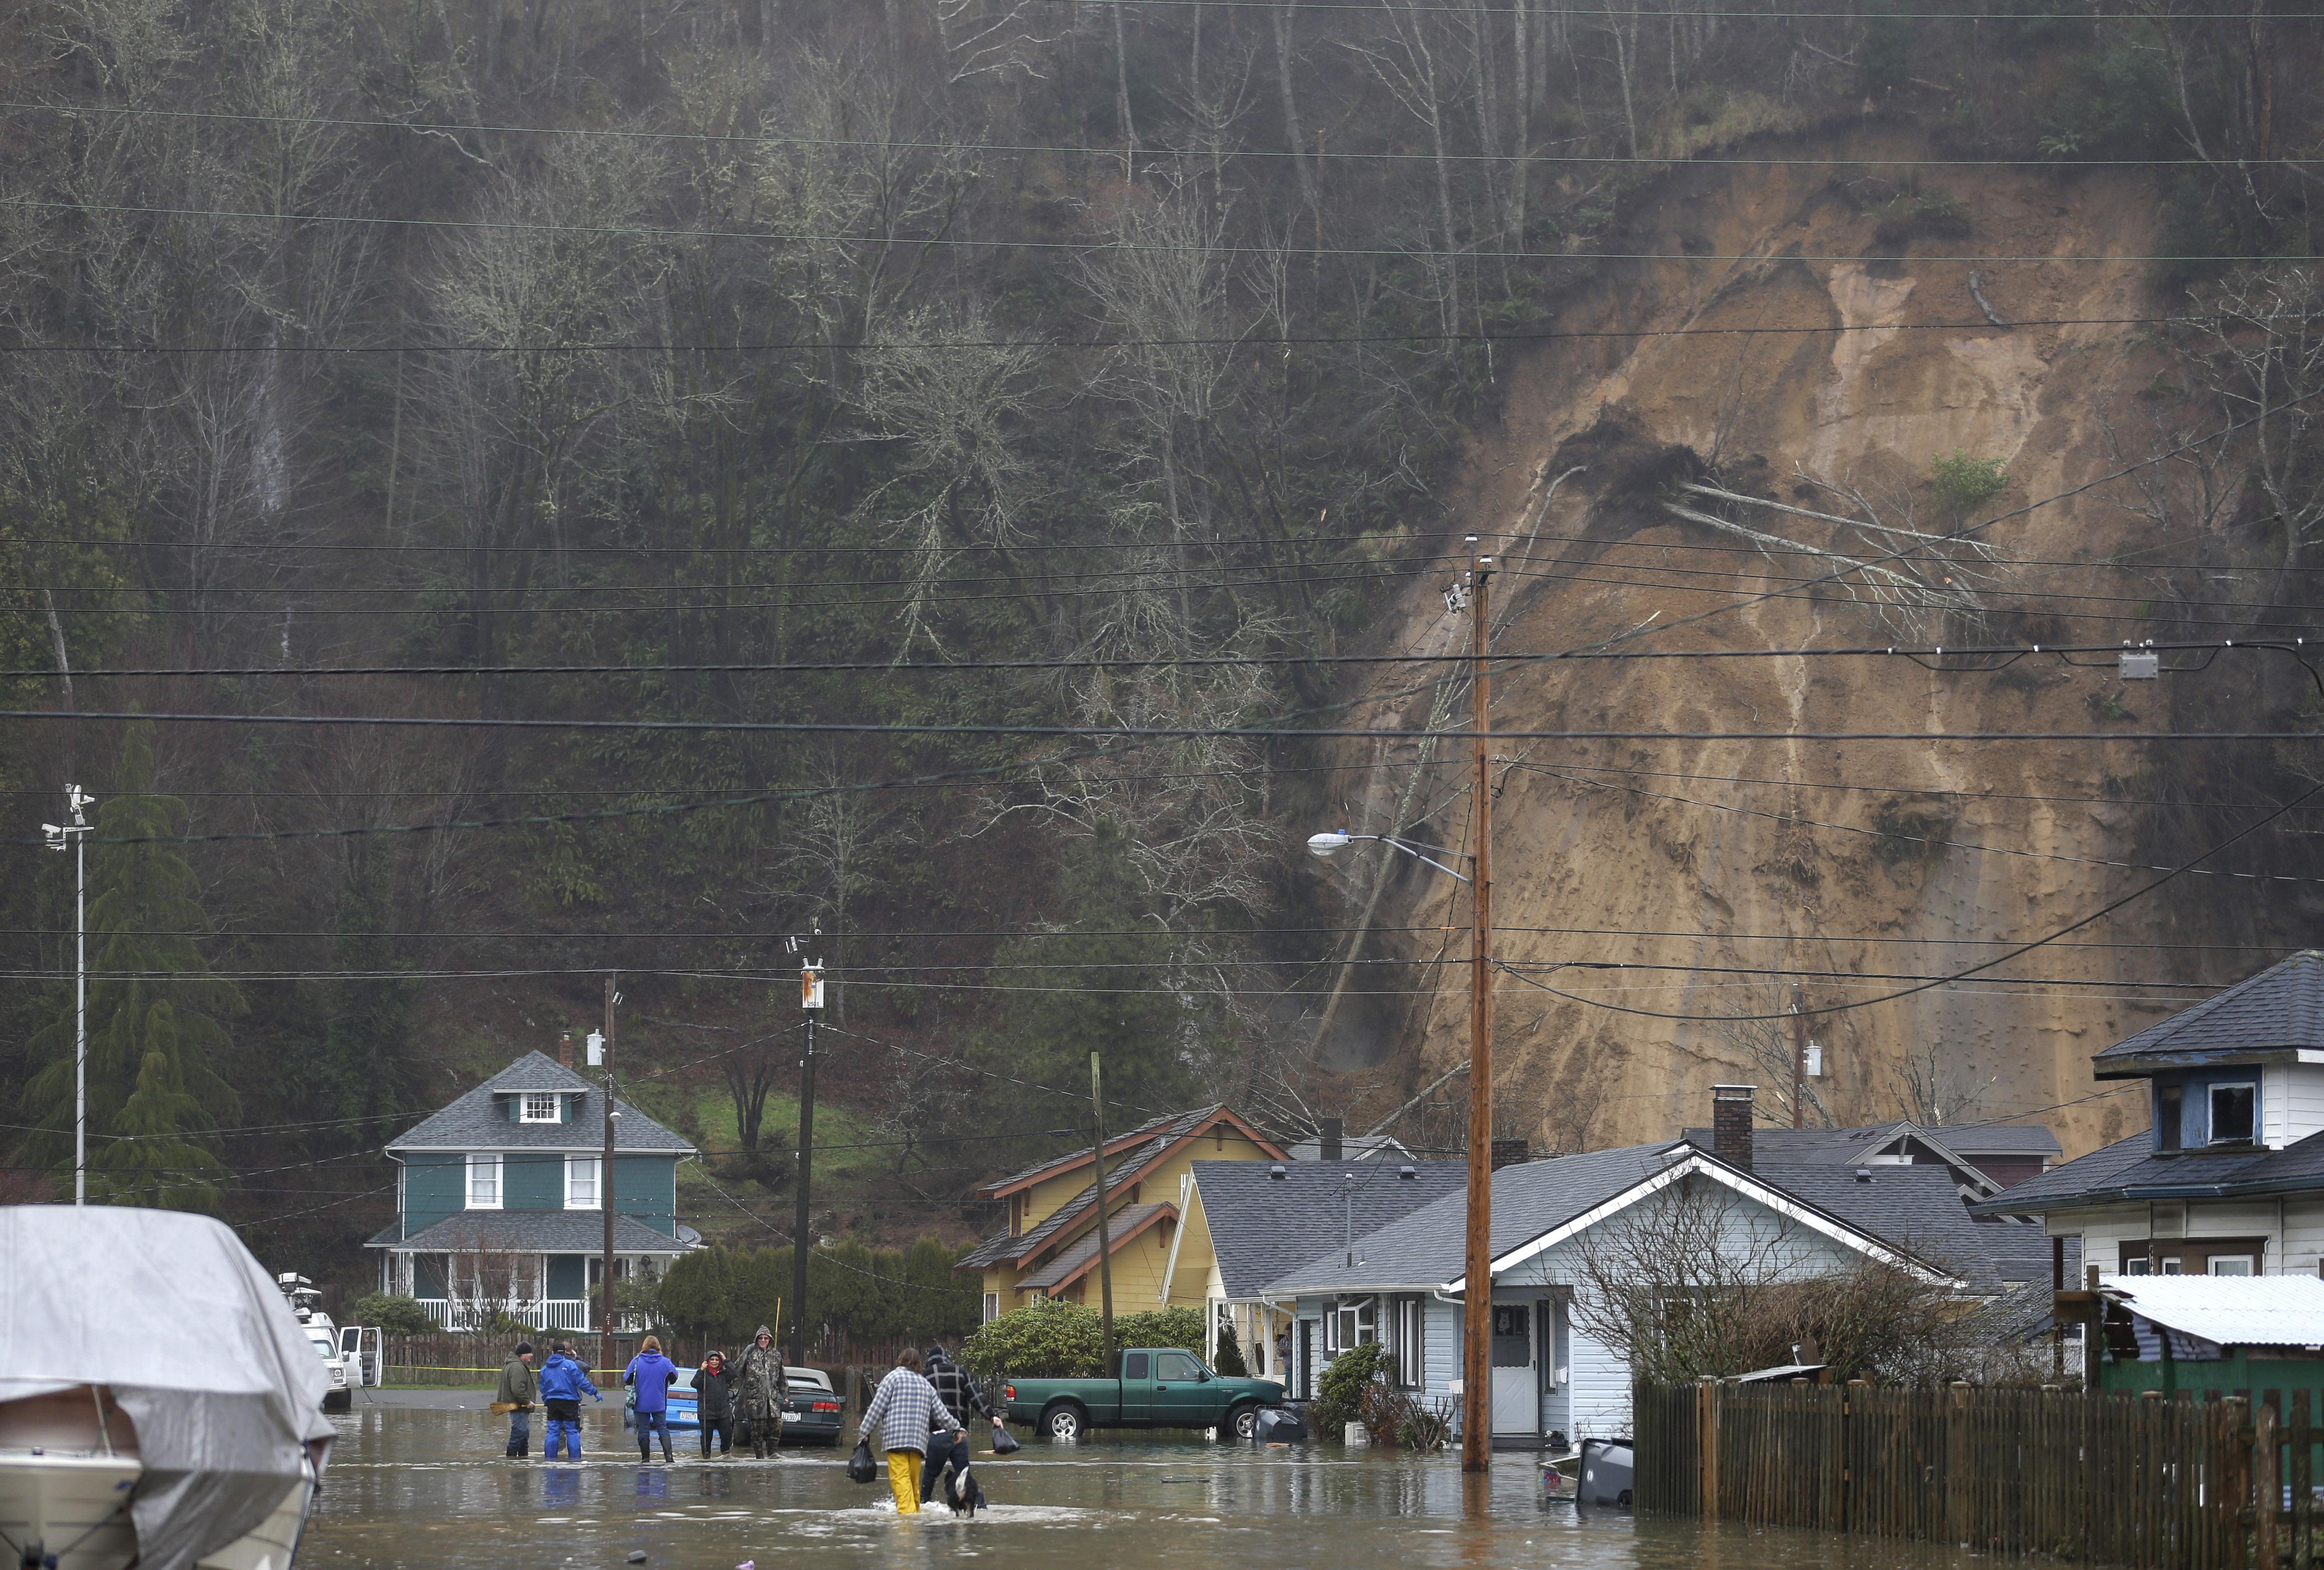 Flooding Evacuations Follow Heavy Rain On West Side The